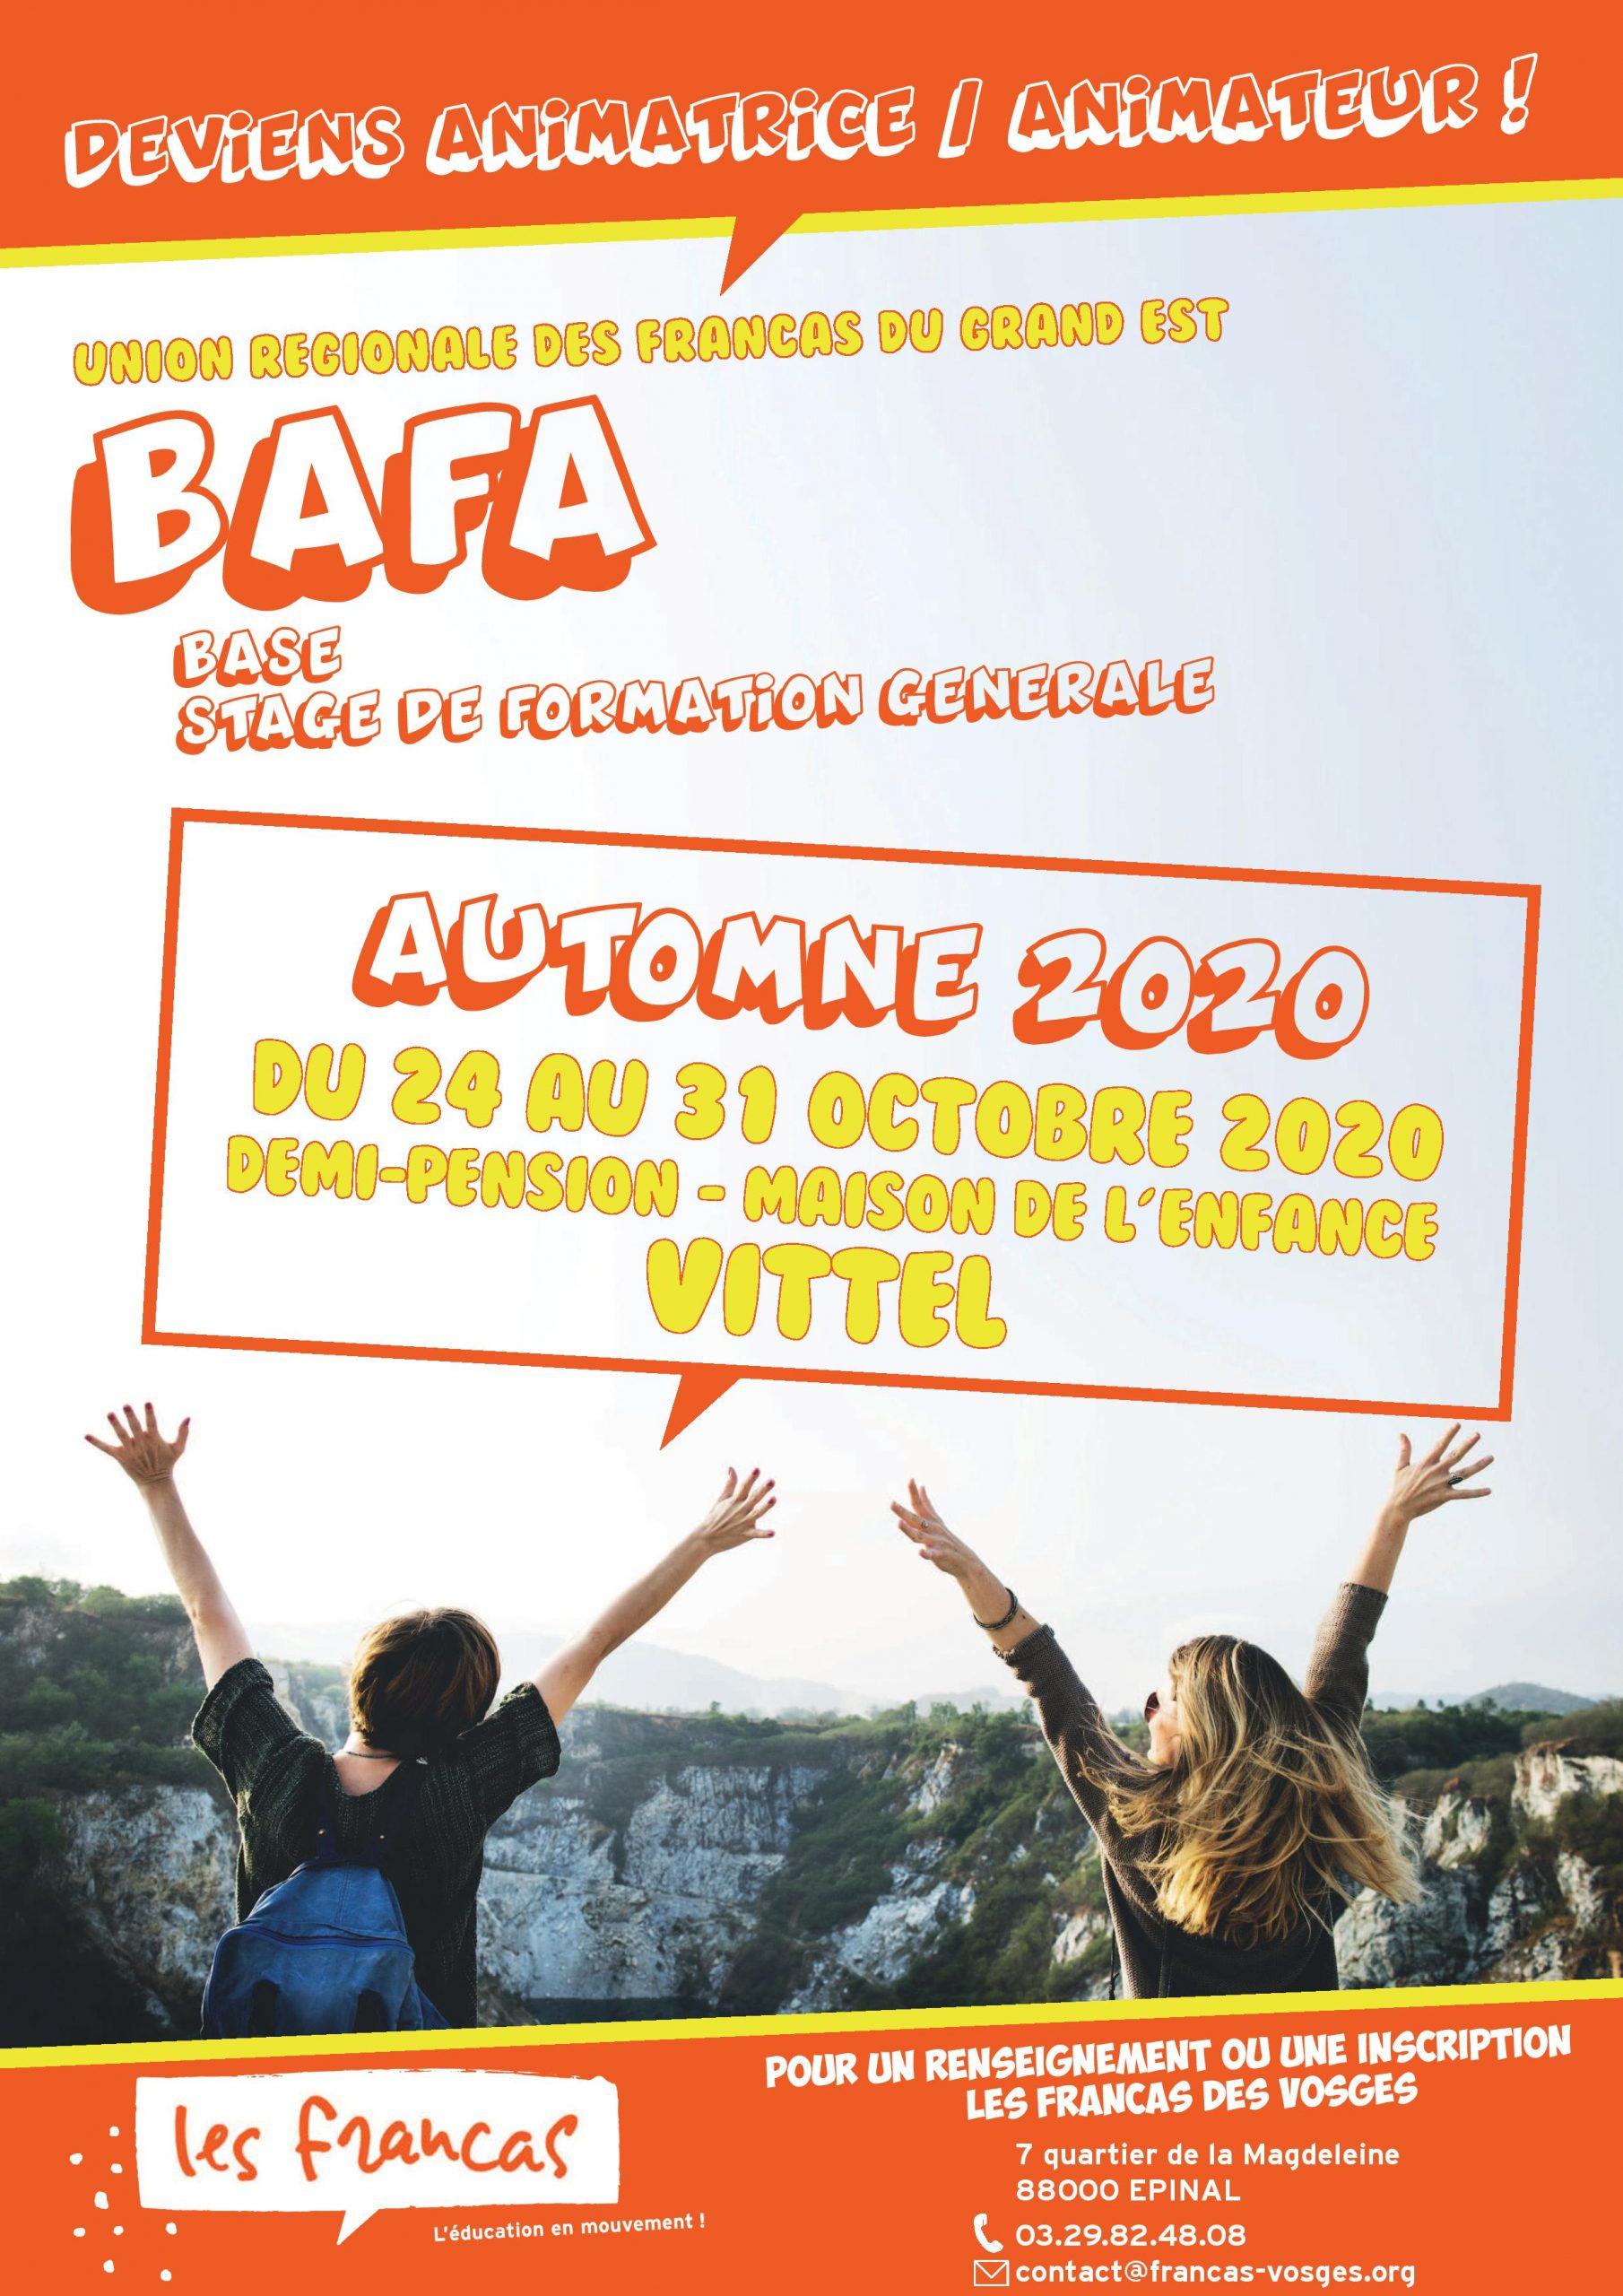 AFFICHE BAFA Base VITTEL Automne 2020 c-page-001